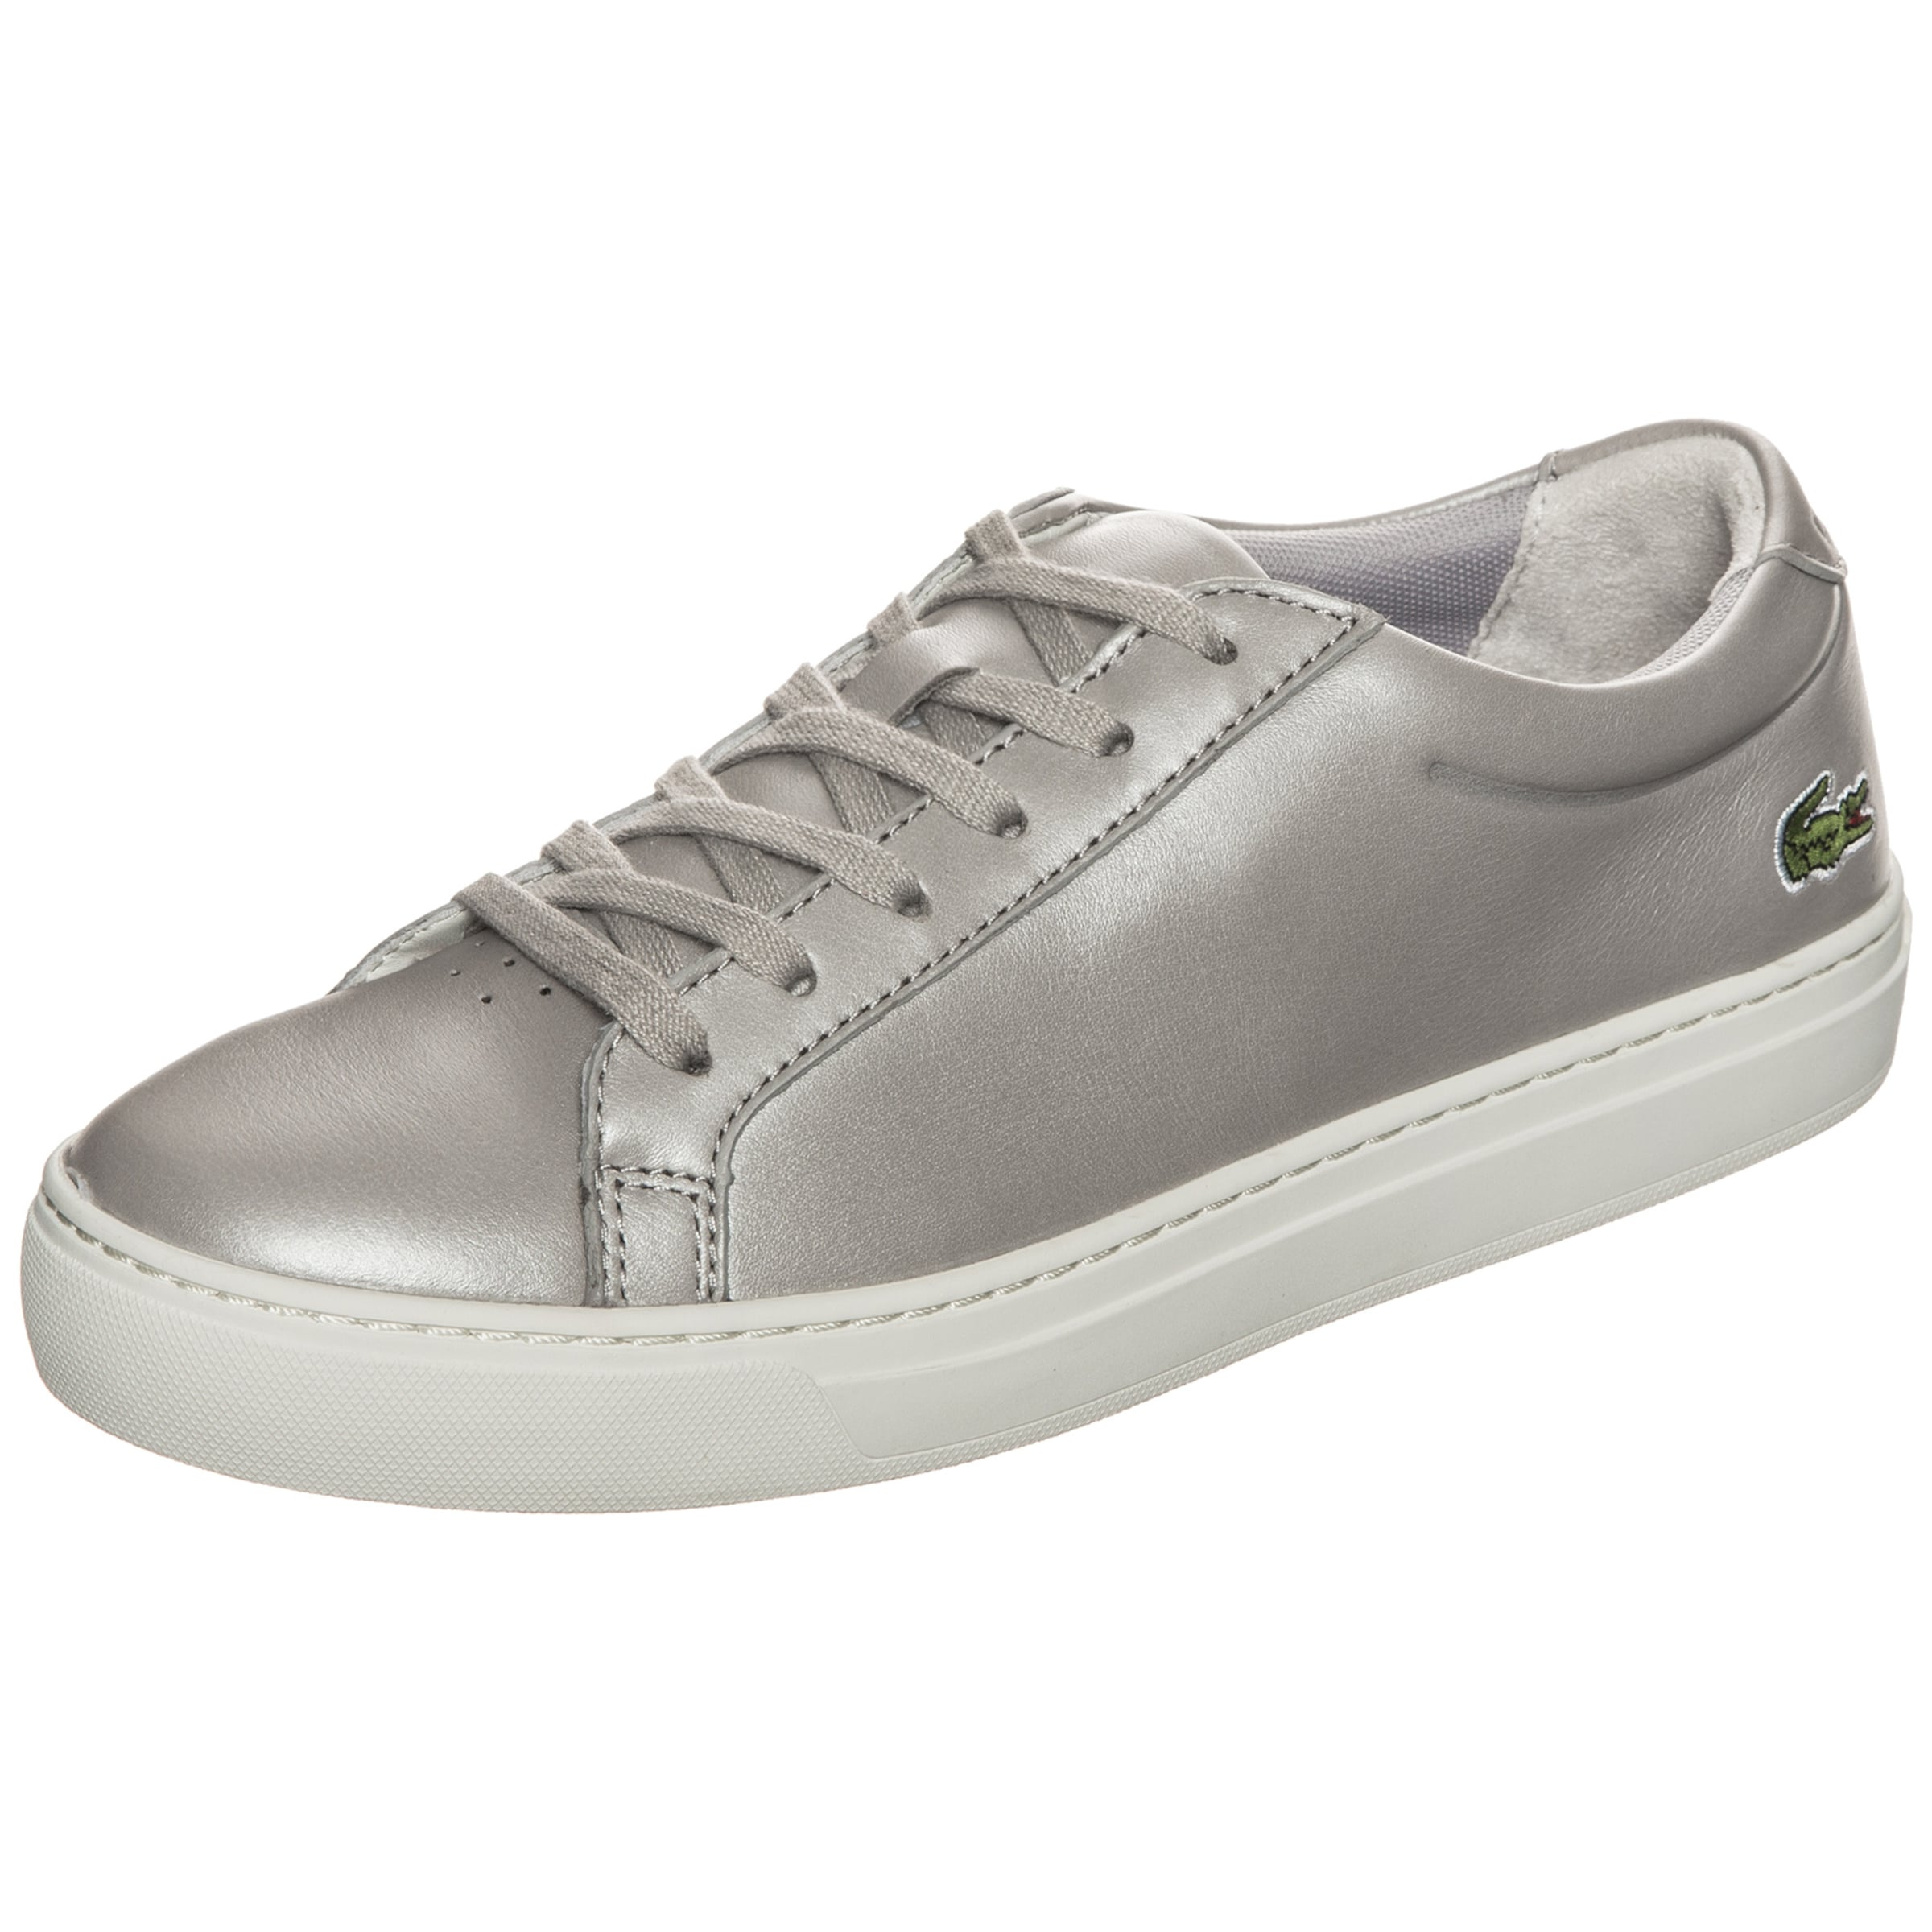 LACOSTE L.12.12 Sneaker Damen Verschleißfeste billige Schuhe